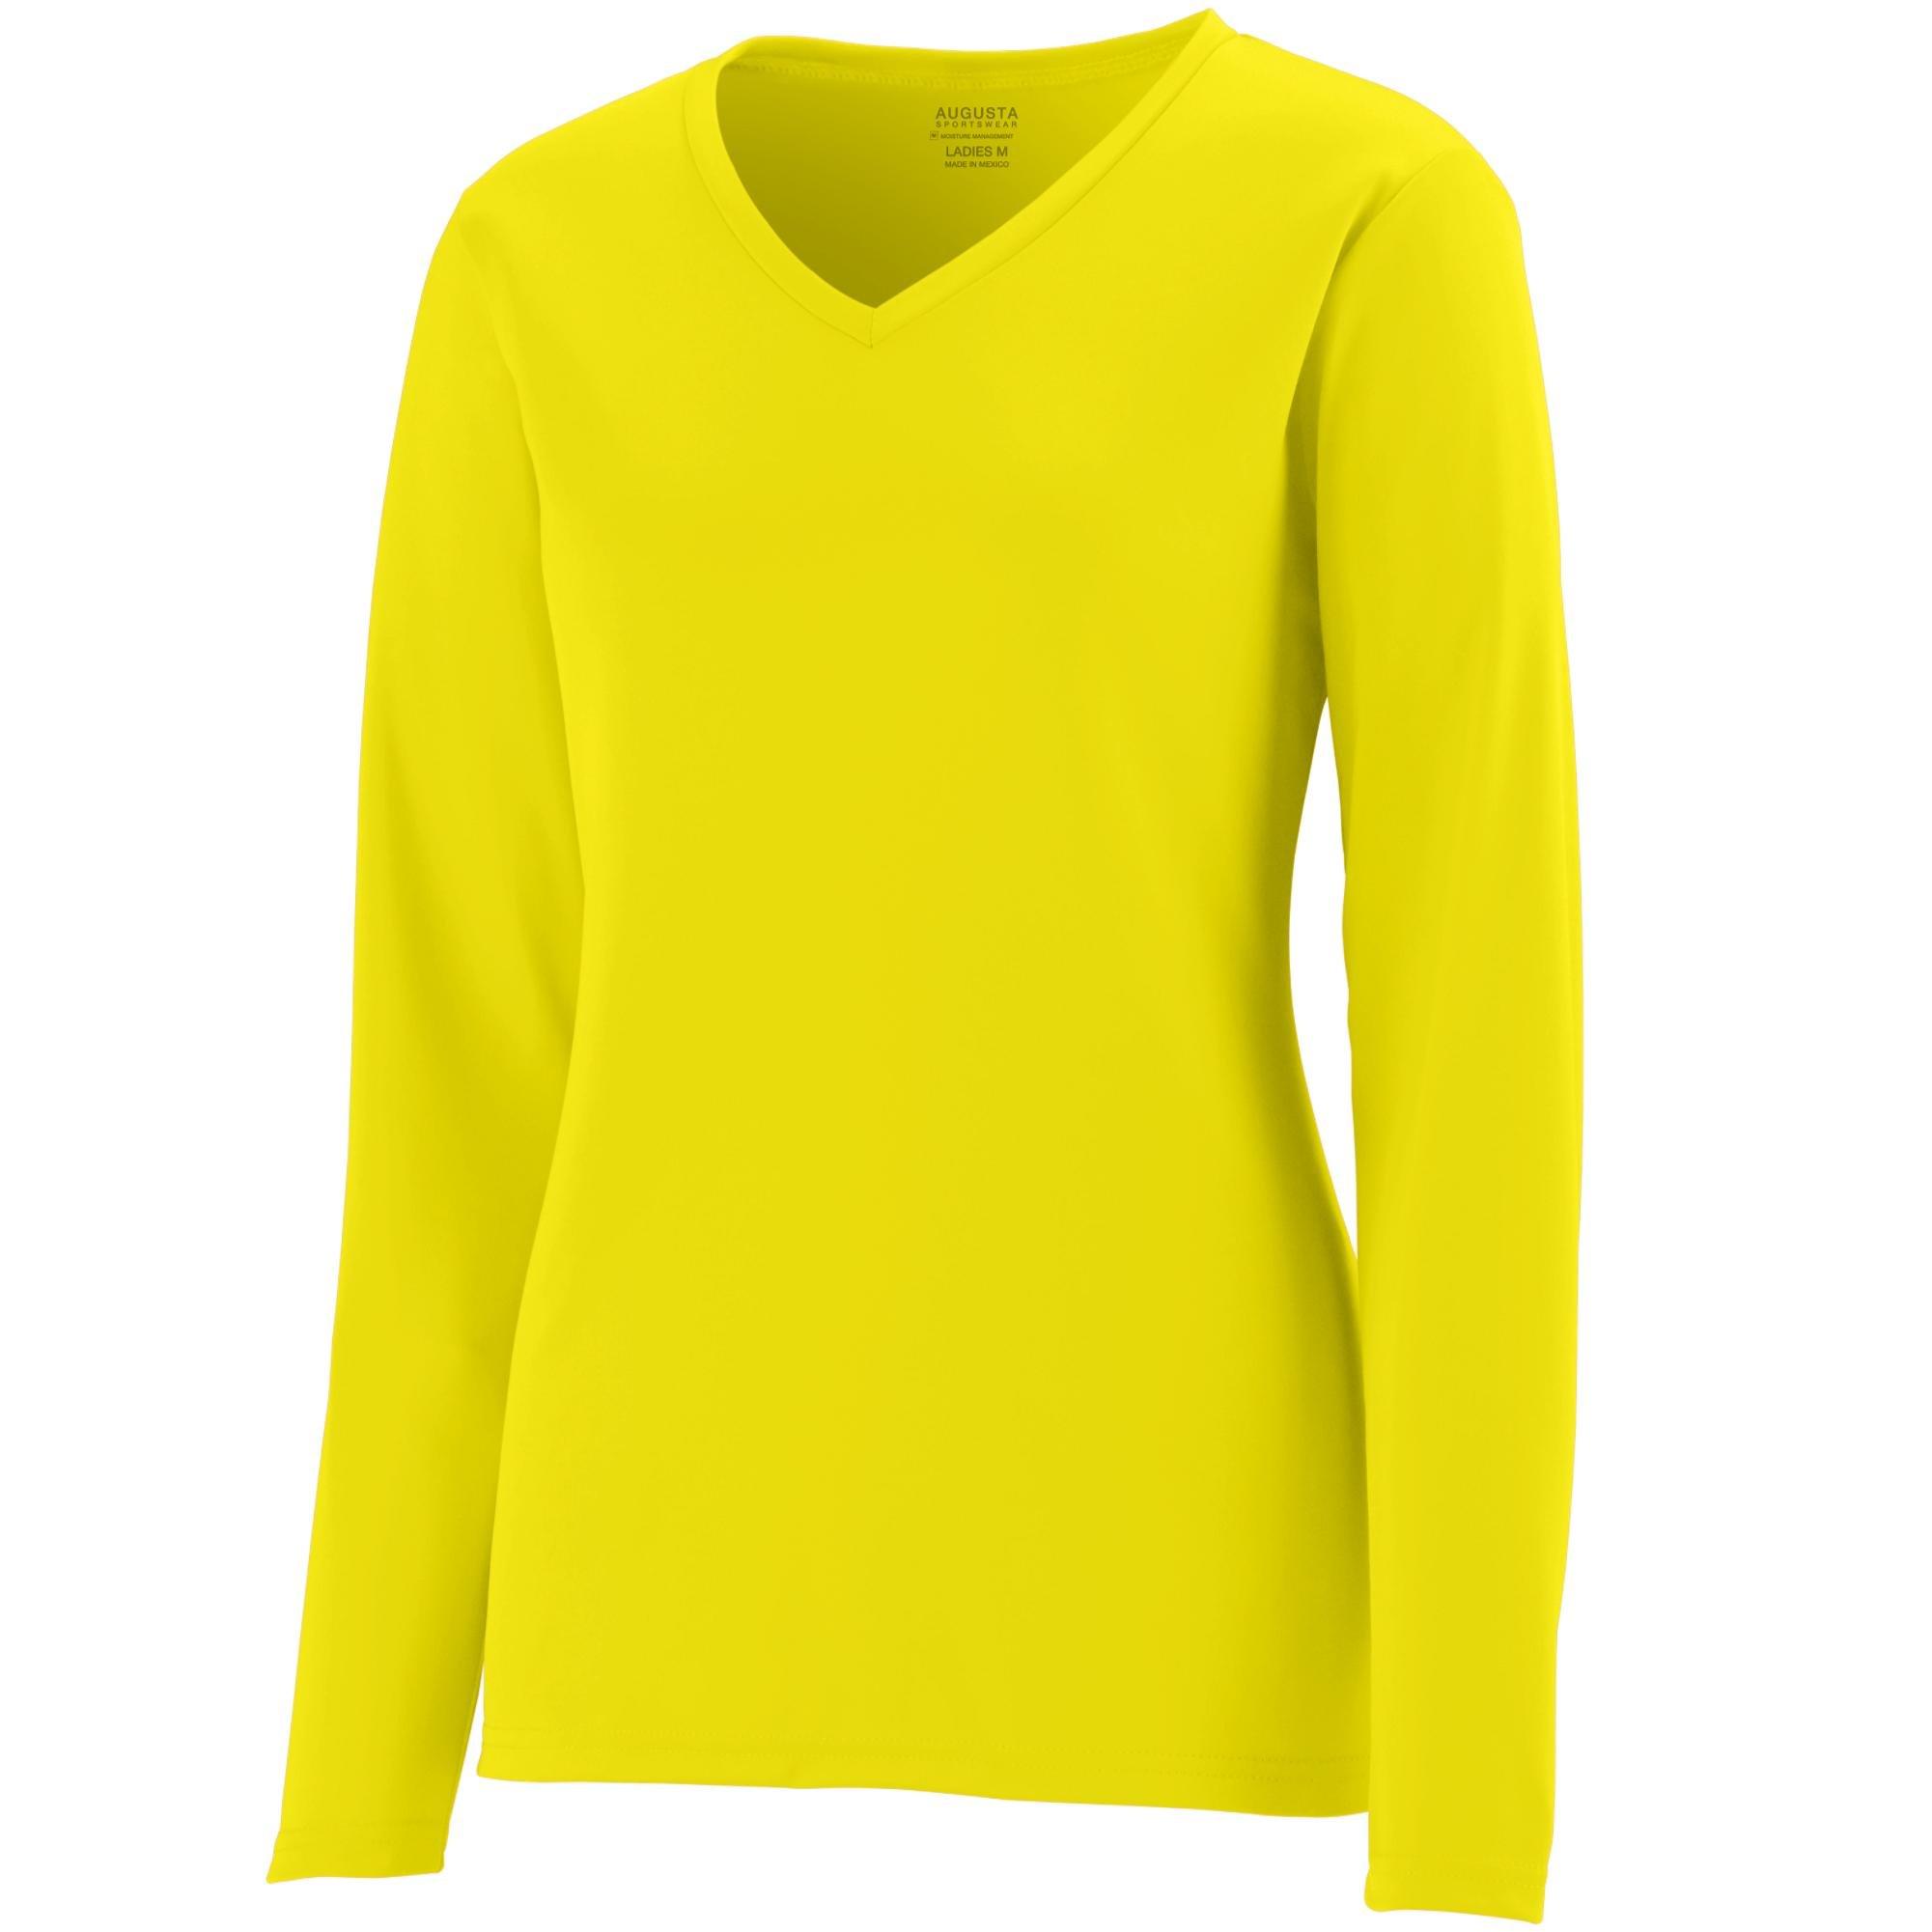 Augusta Sportswear Womens Long Sleeve Wicking T-Shirt, Power Yellow, 3X-Large